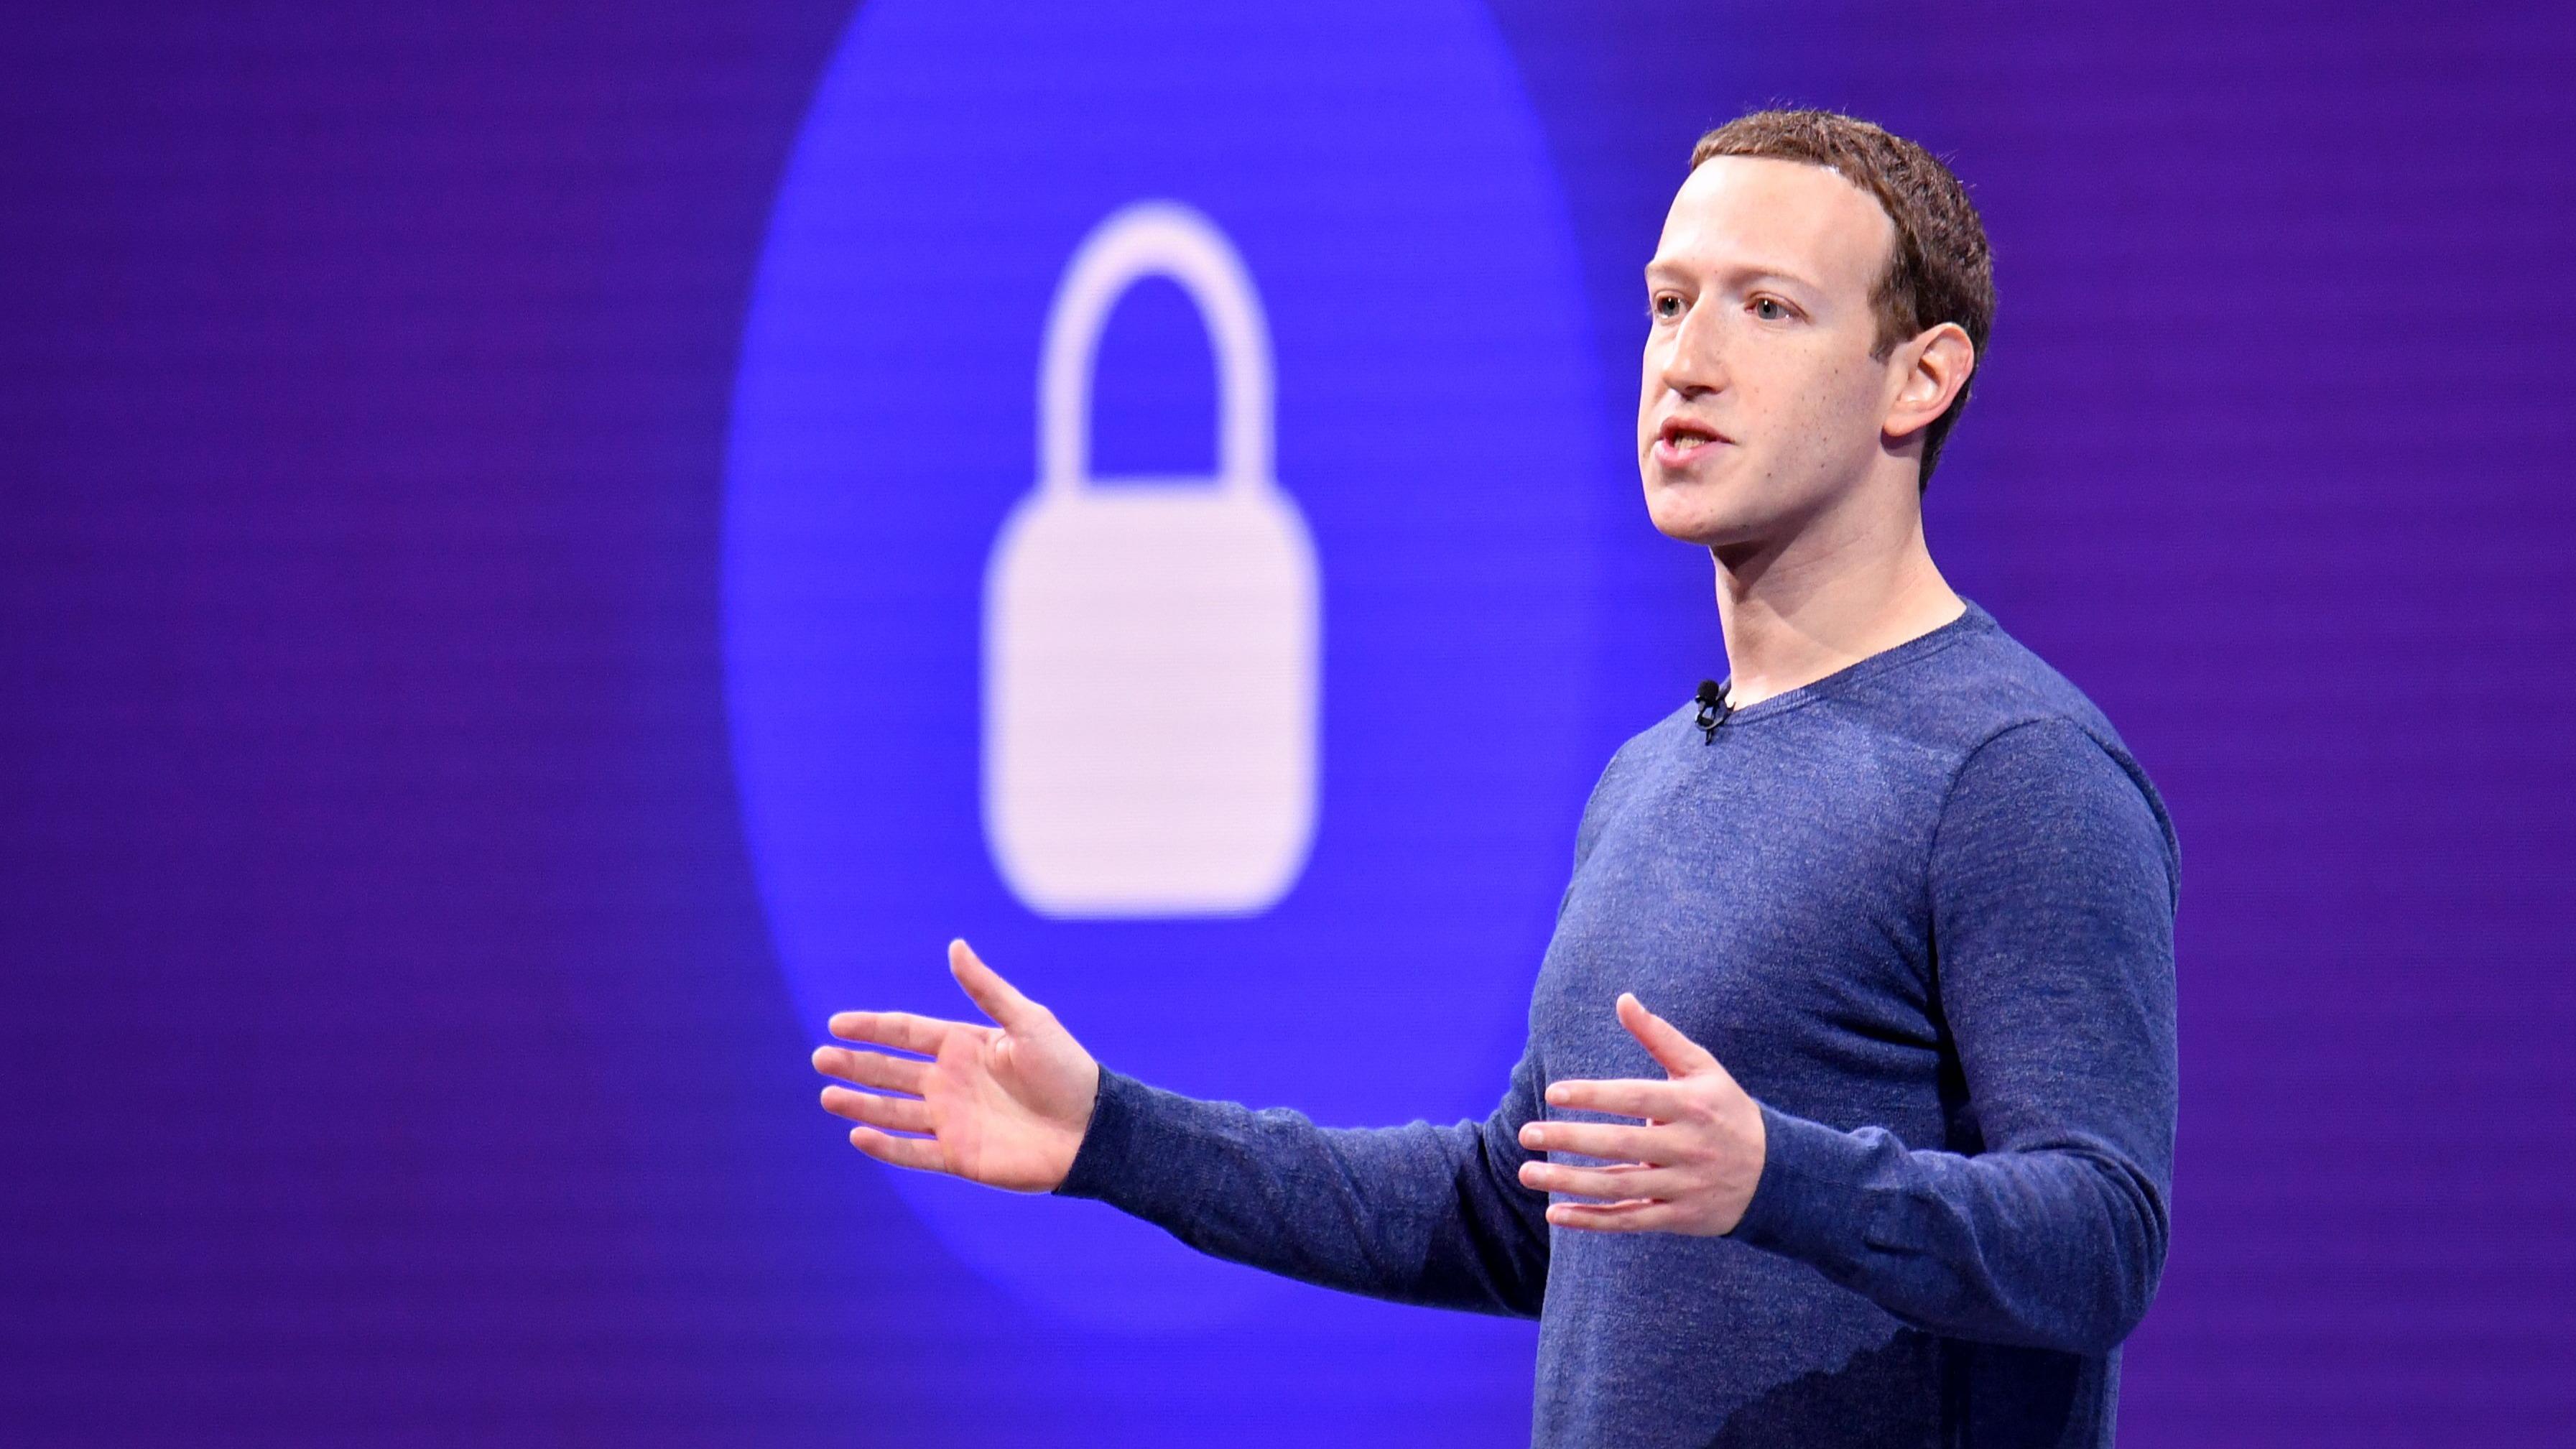 Facebook CEO Mark Zuckerberg speaks during the annual F8 summit